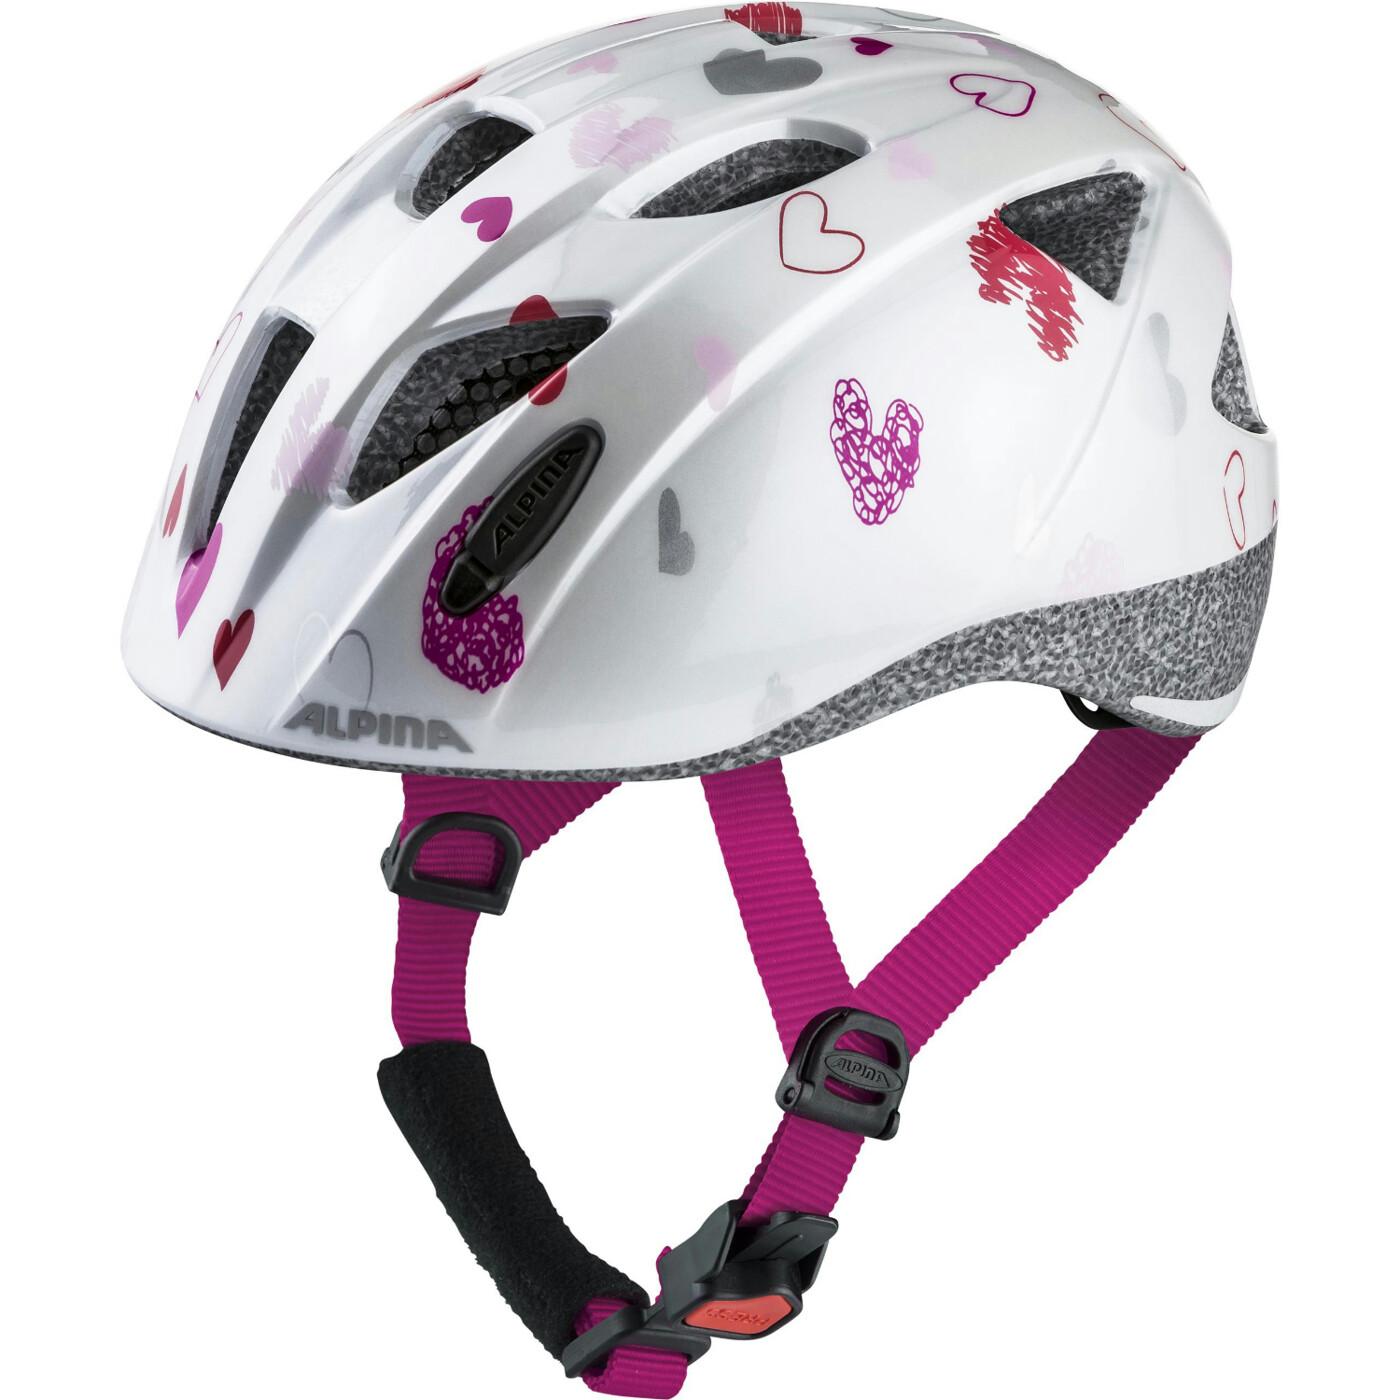 Bikehelm Ximo Kid Alpina - Kinder